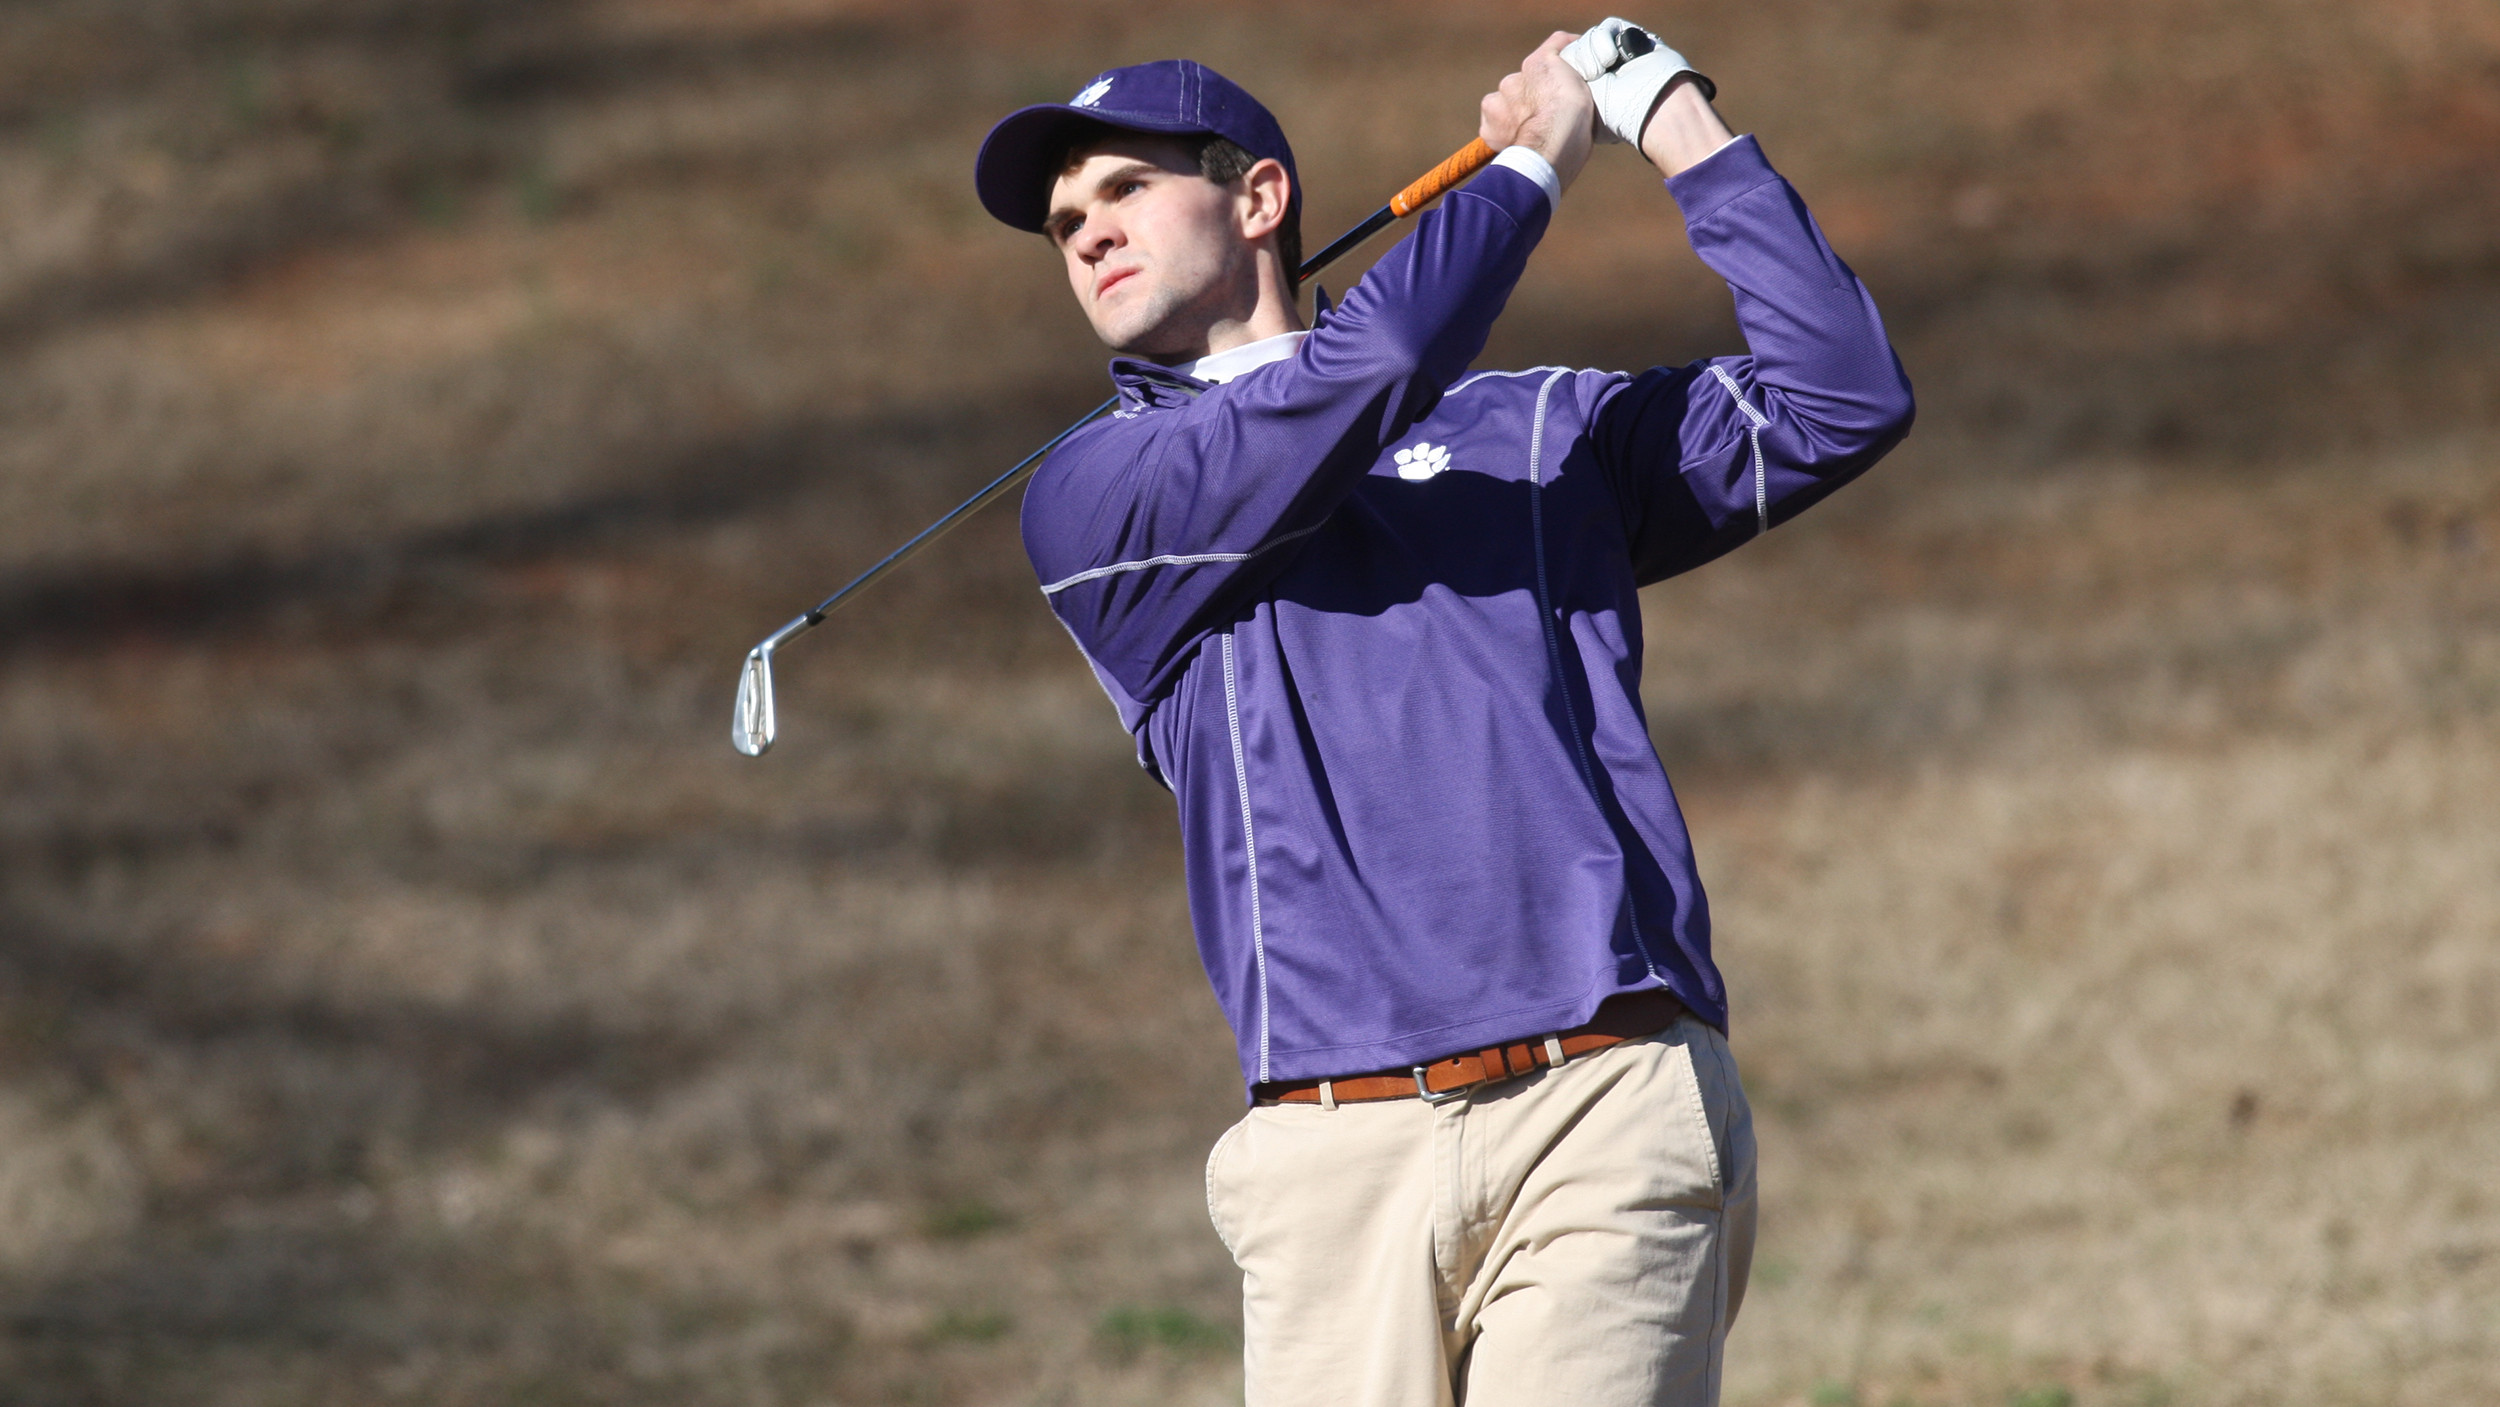 Garrett Falls in Playoff at Charleston Shootout